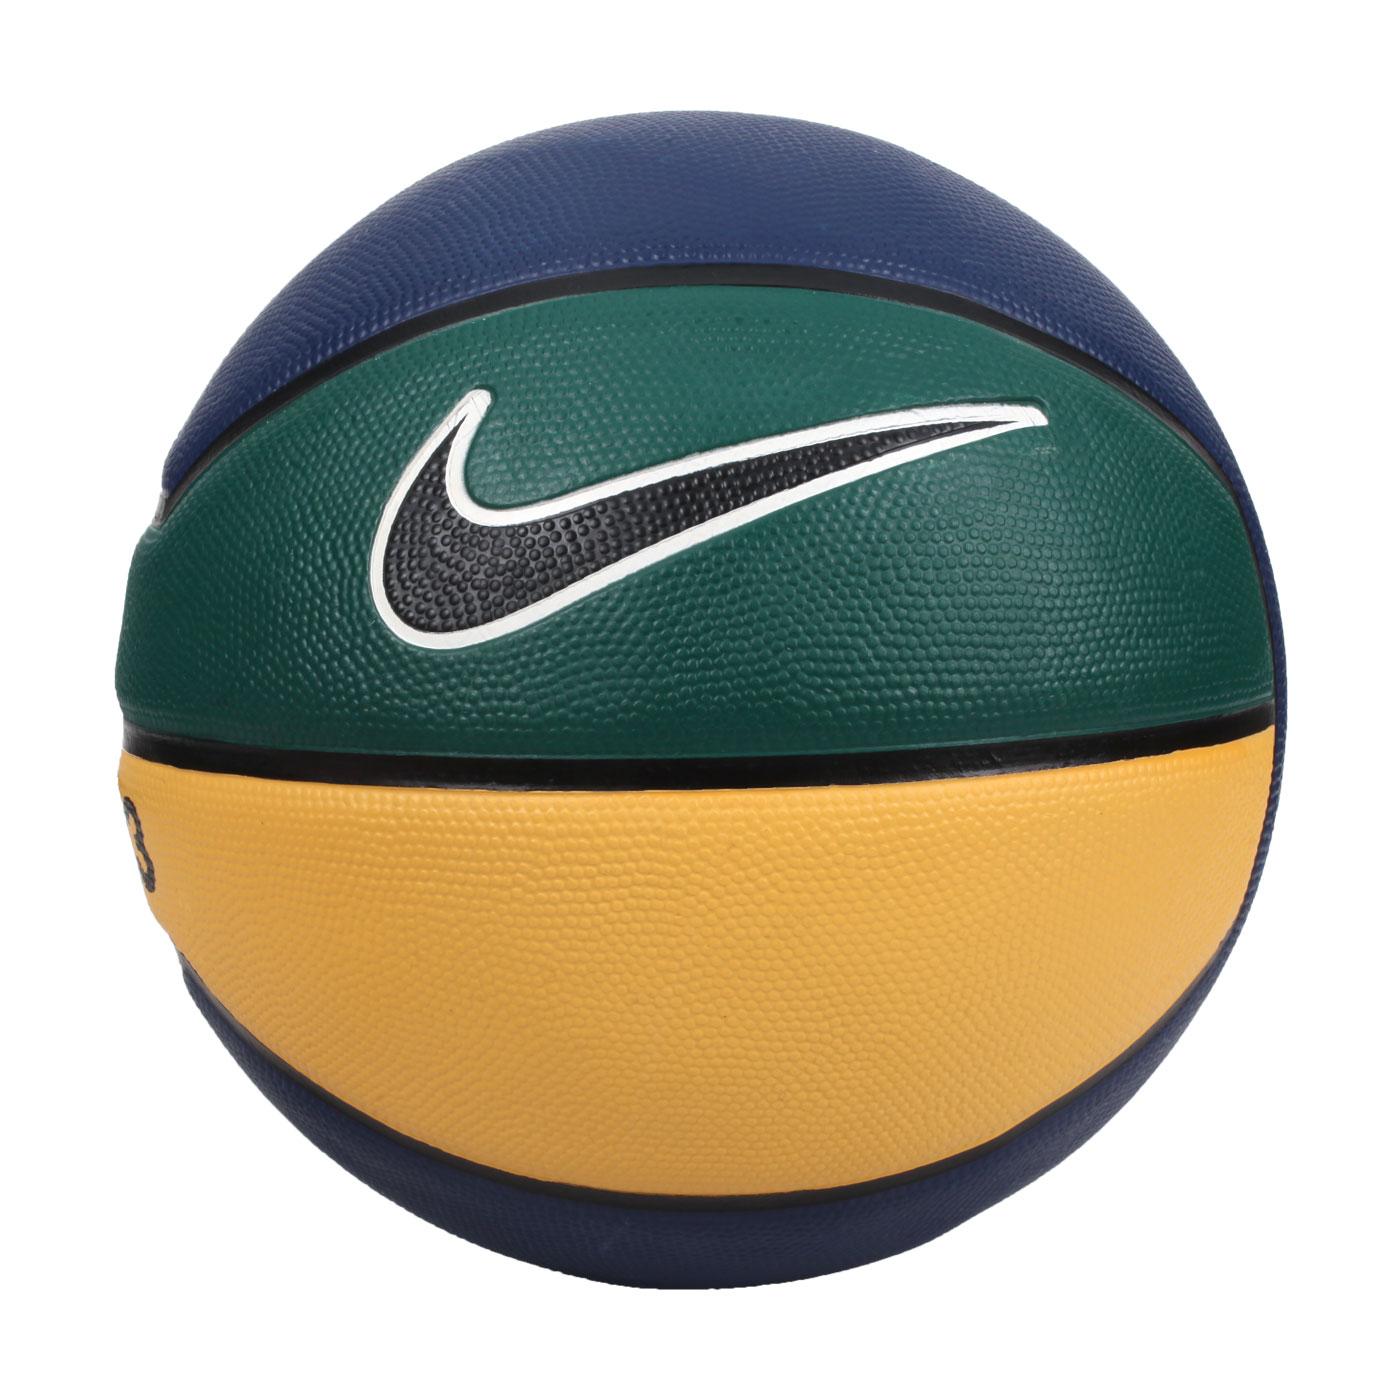 NIKE LEBRON PLAYGROUND 4P 7號籃球 N000278449007 - 丈青黃綠